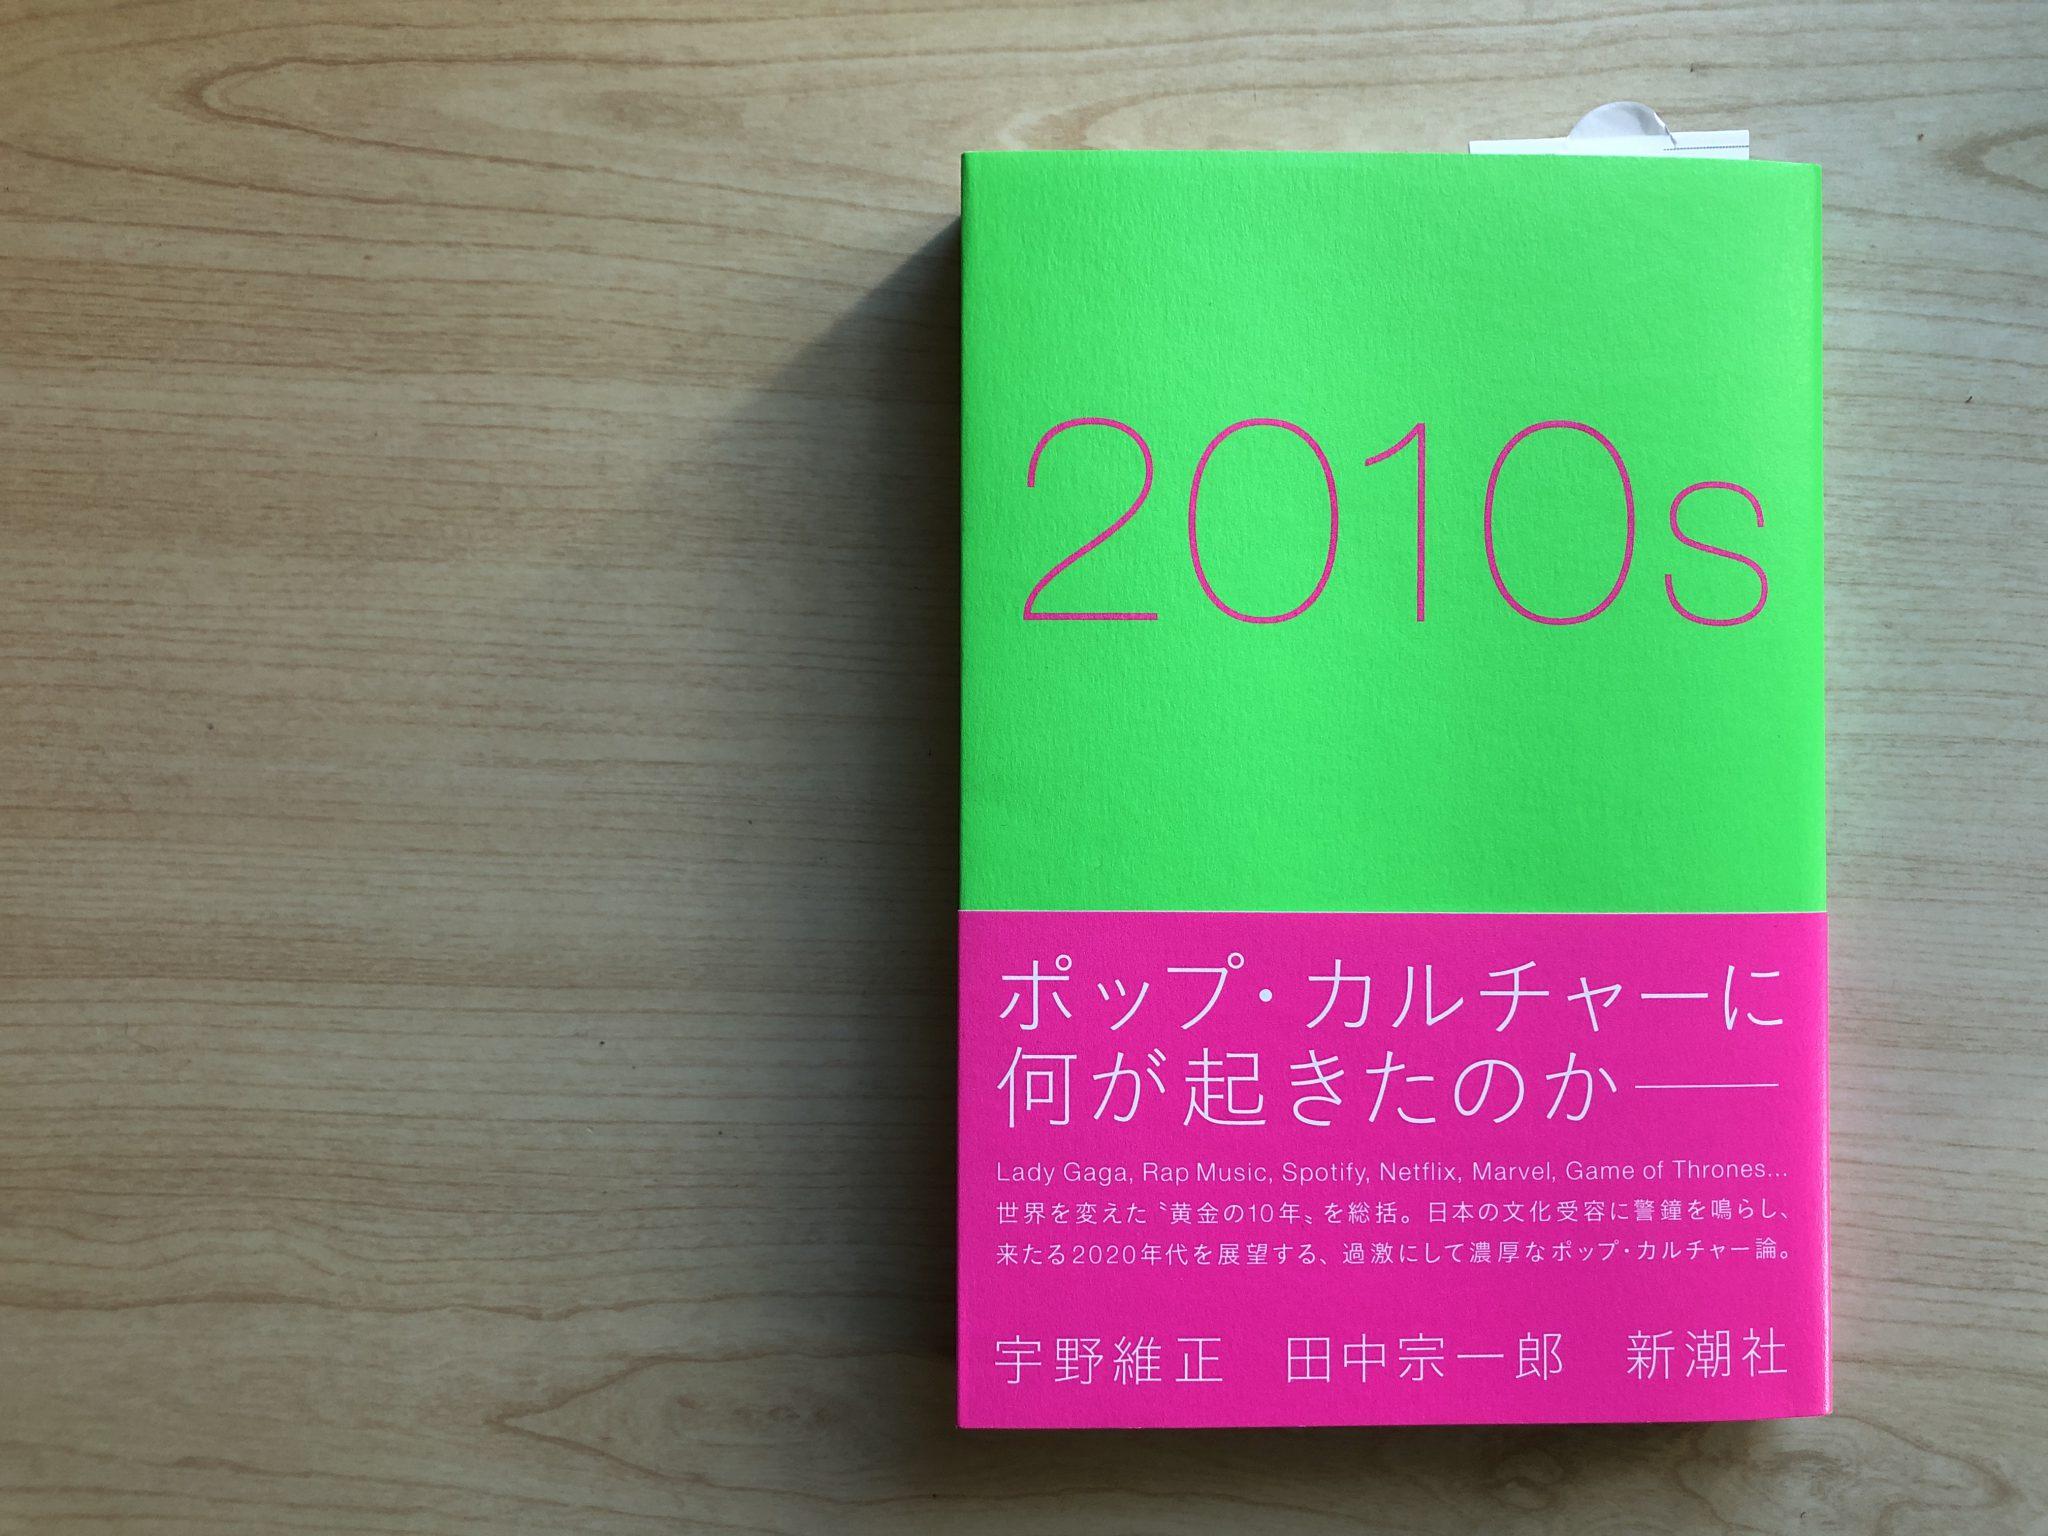 2010s~日本社会に蔓延する根拠のない「自己肯定感」と慎重に距離を置いて考えよう